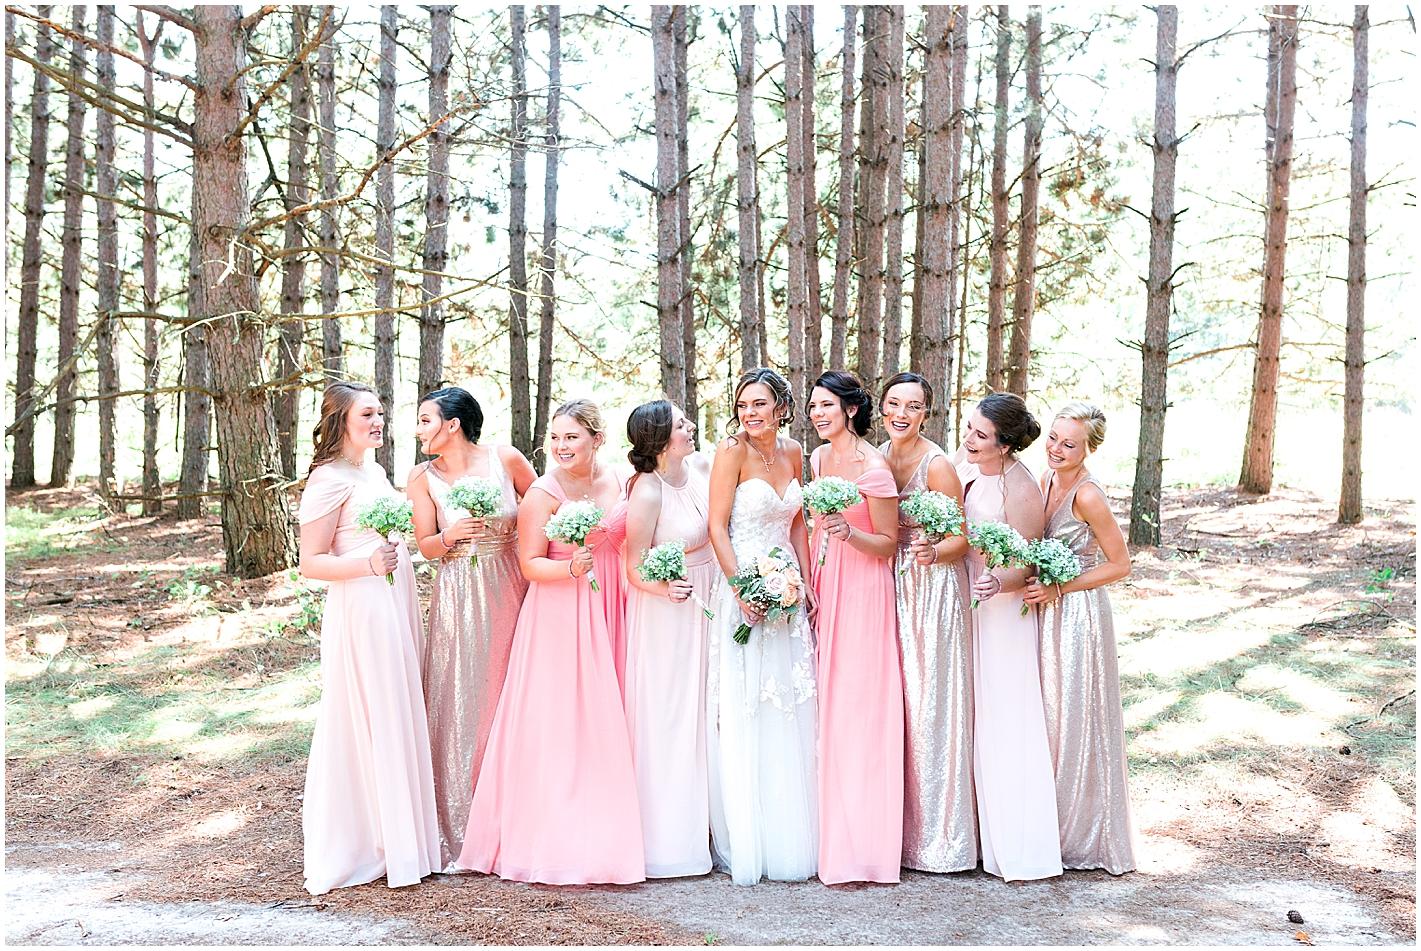 Rustic Wedding Nisswa MN photos by Alyssa Parker Photography